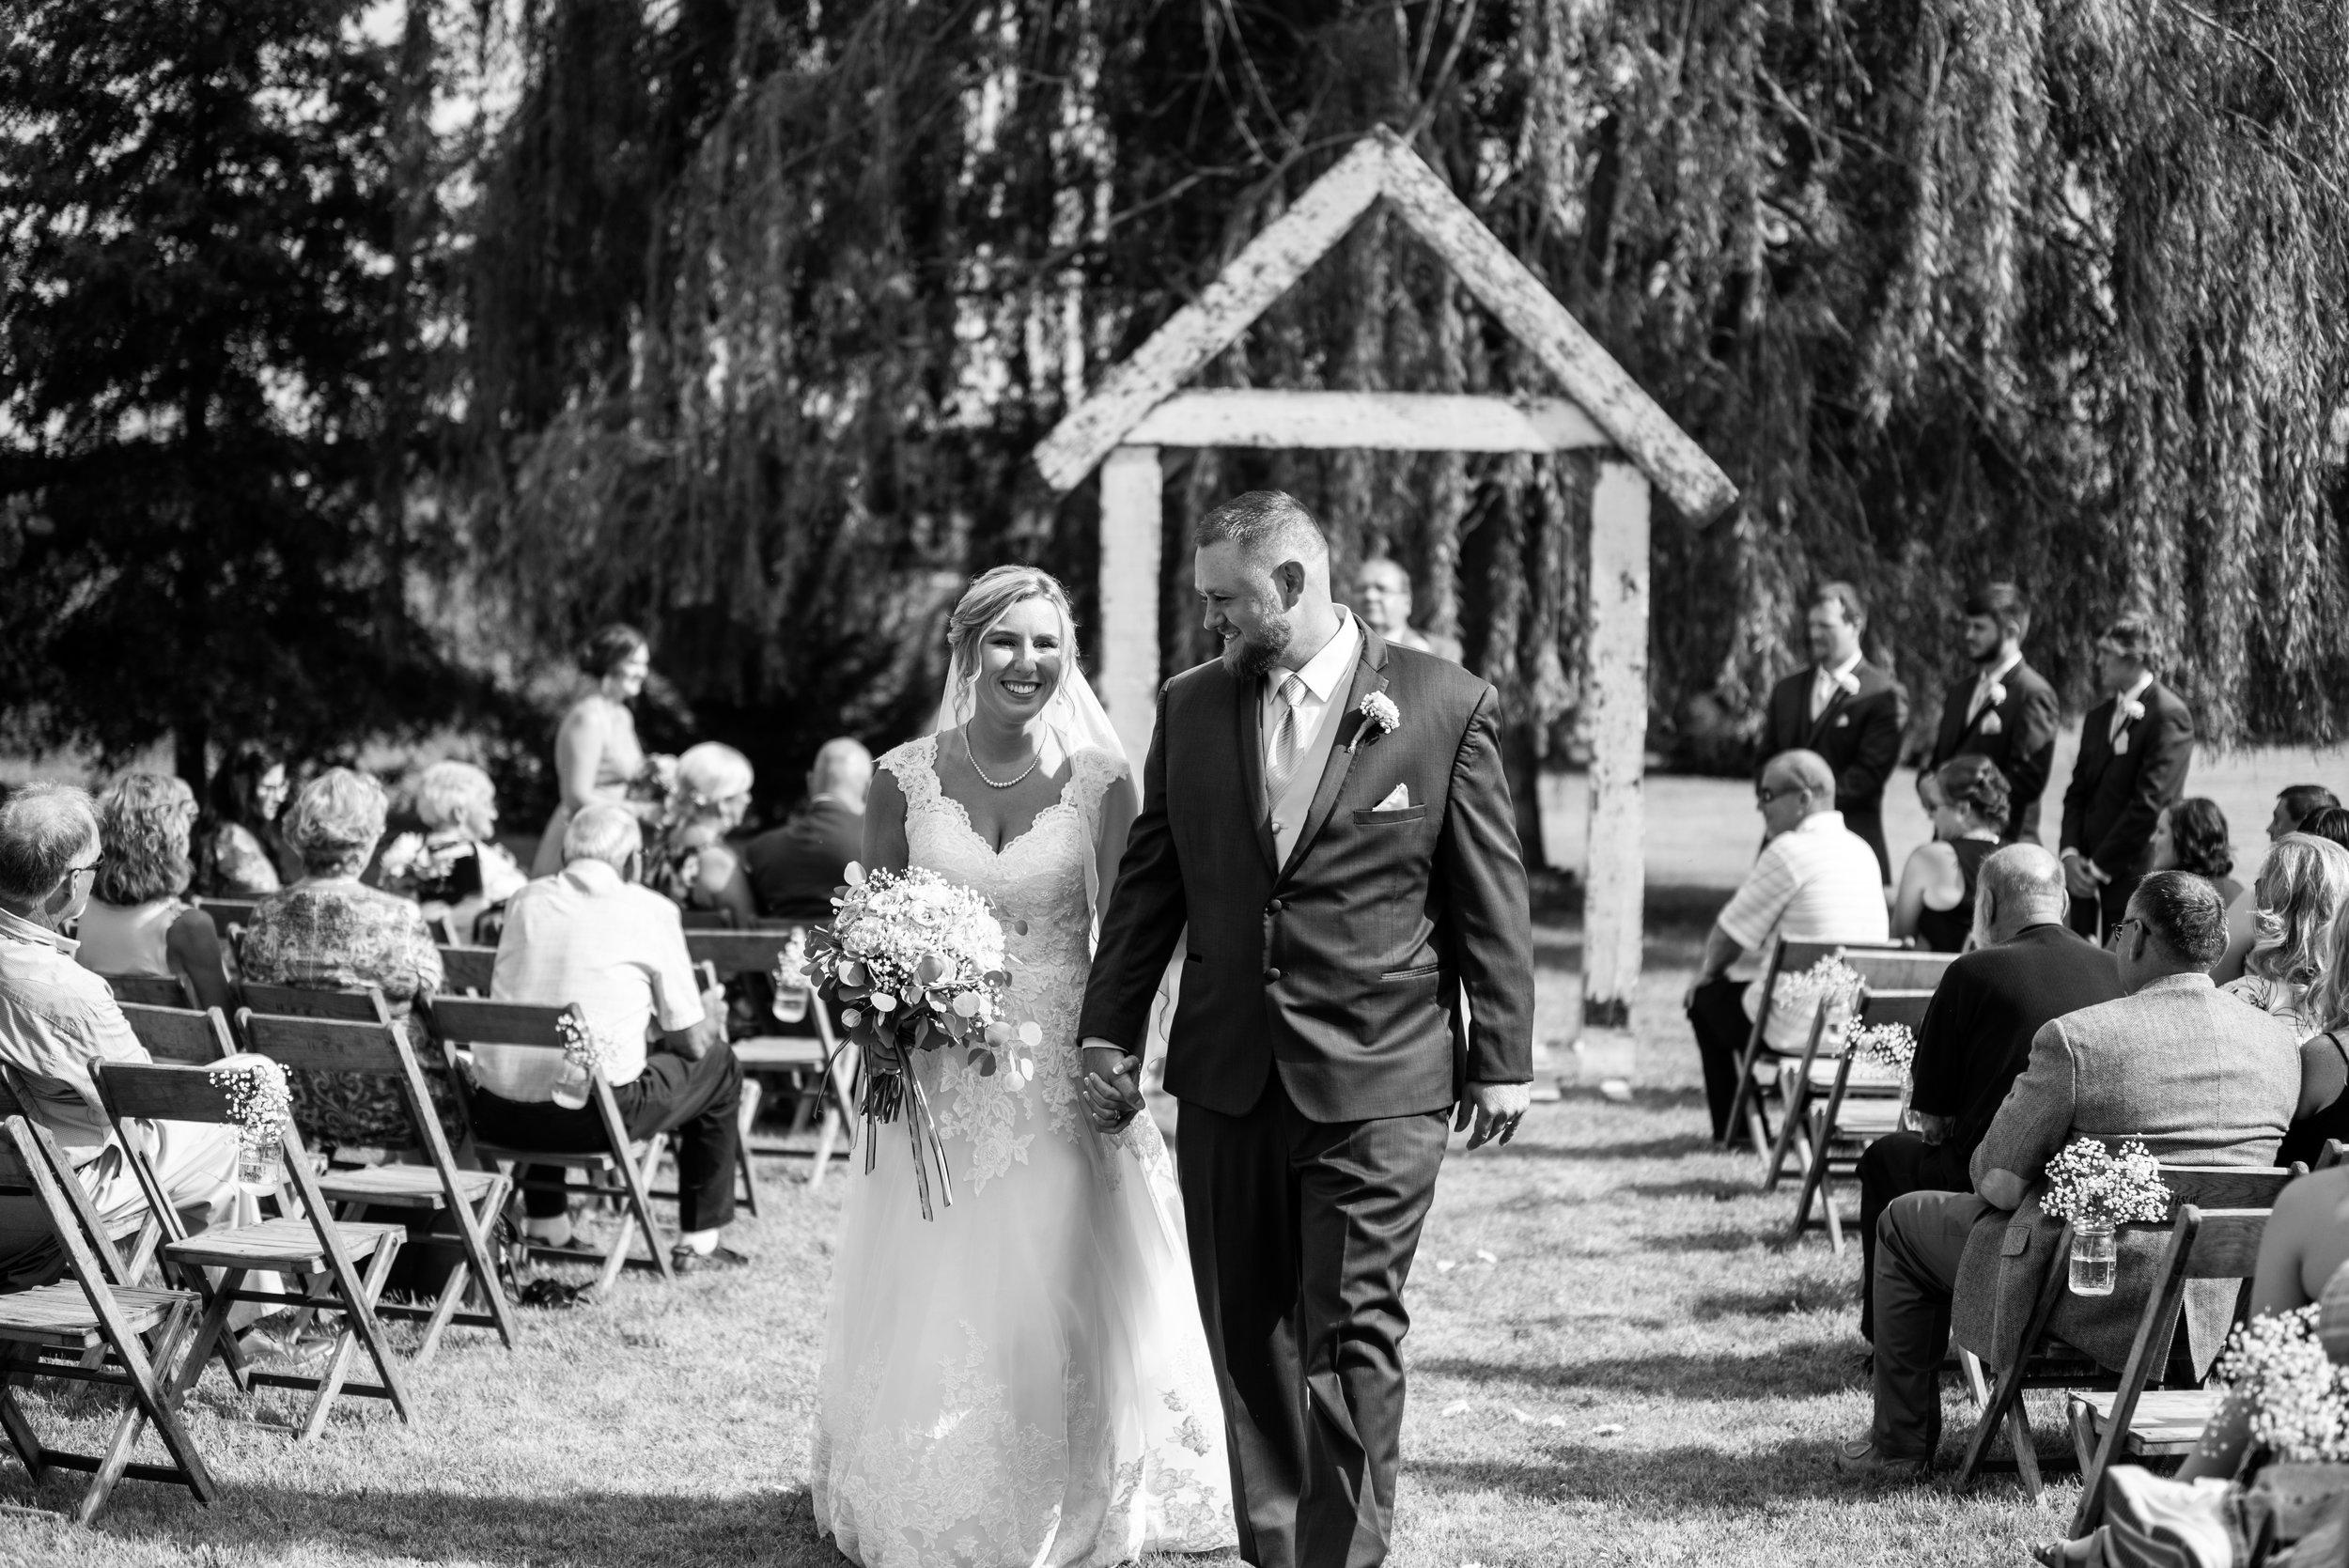 wedding (1 of 1)-92.jpg